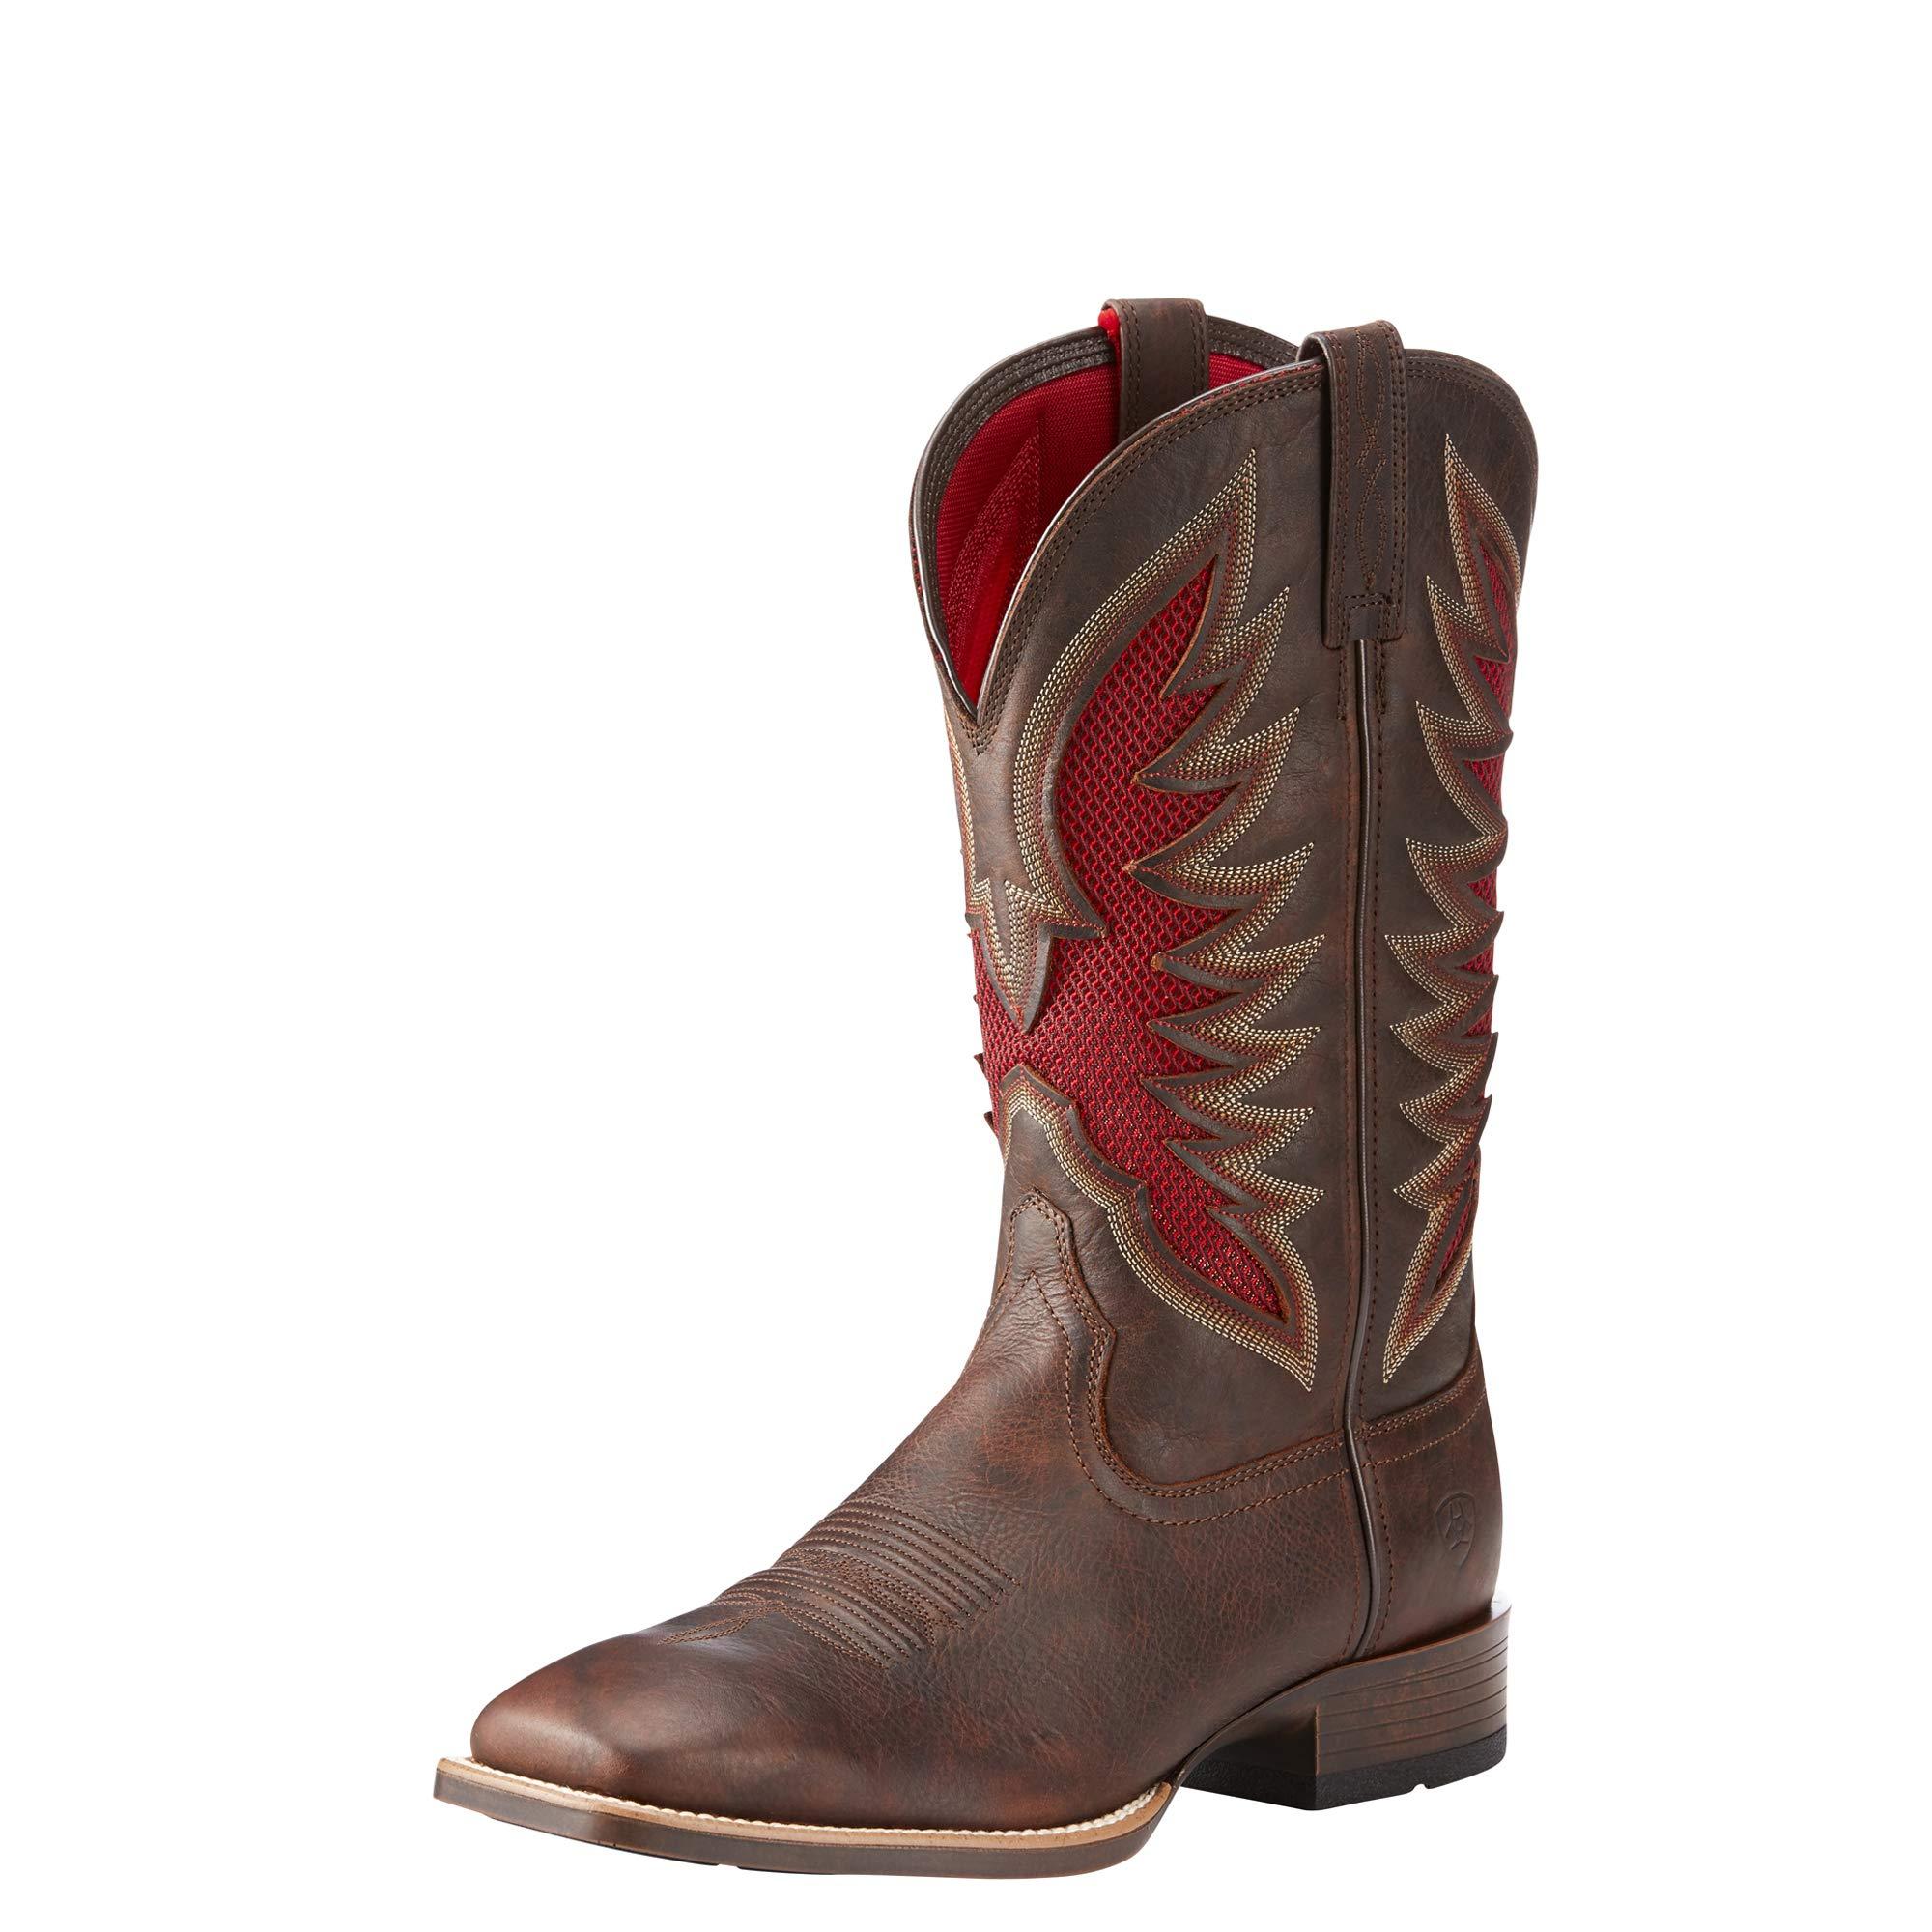 Ariat Men's Venttek Ultra Western Boot, Barley Brown, 8 D US by ARIAT